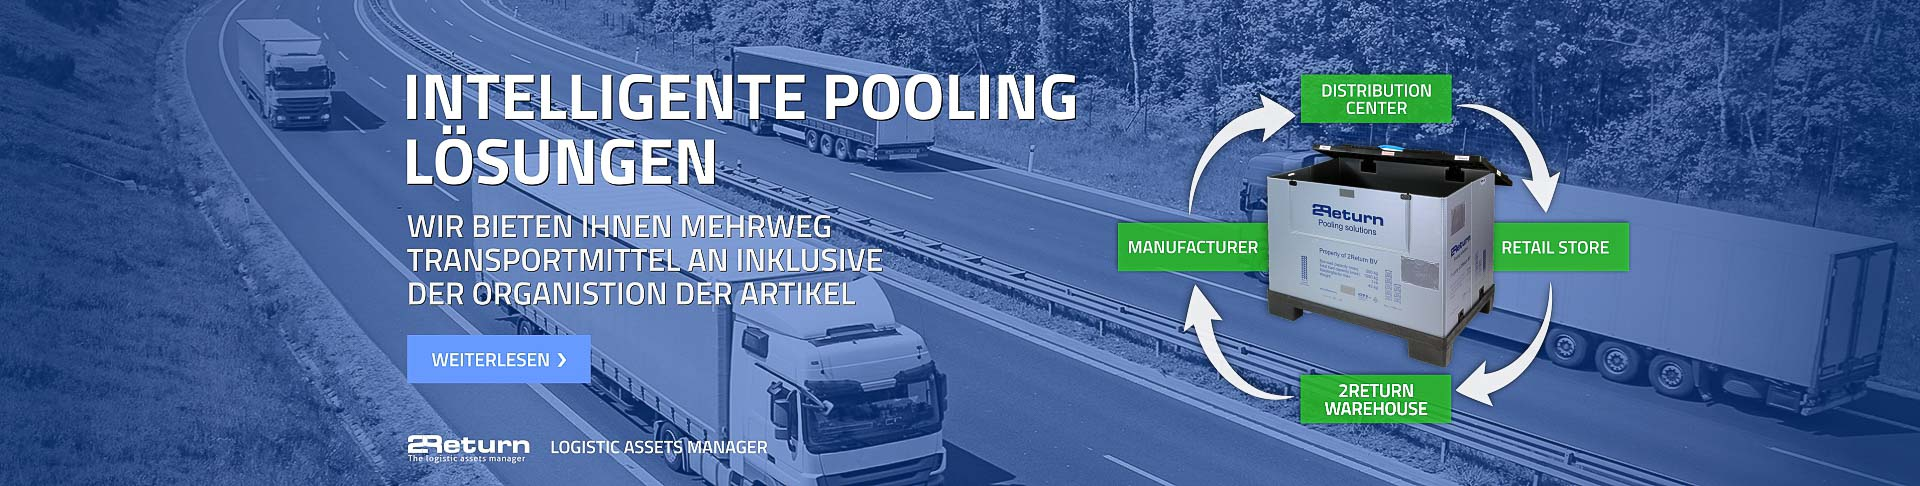 Pooling von Logistik Produkten